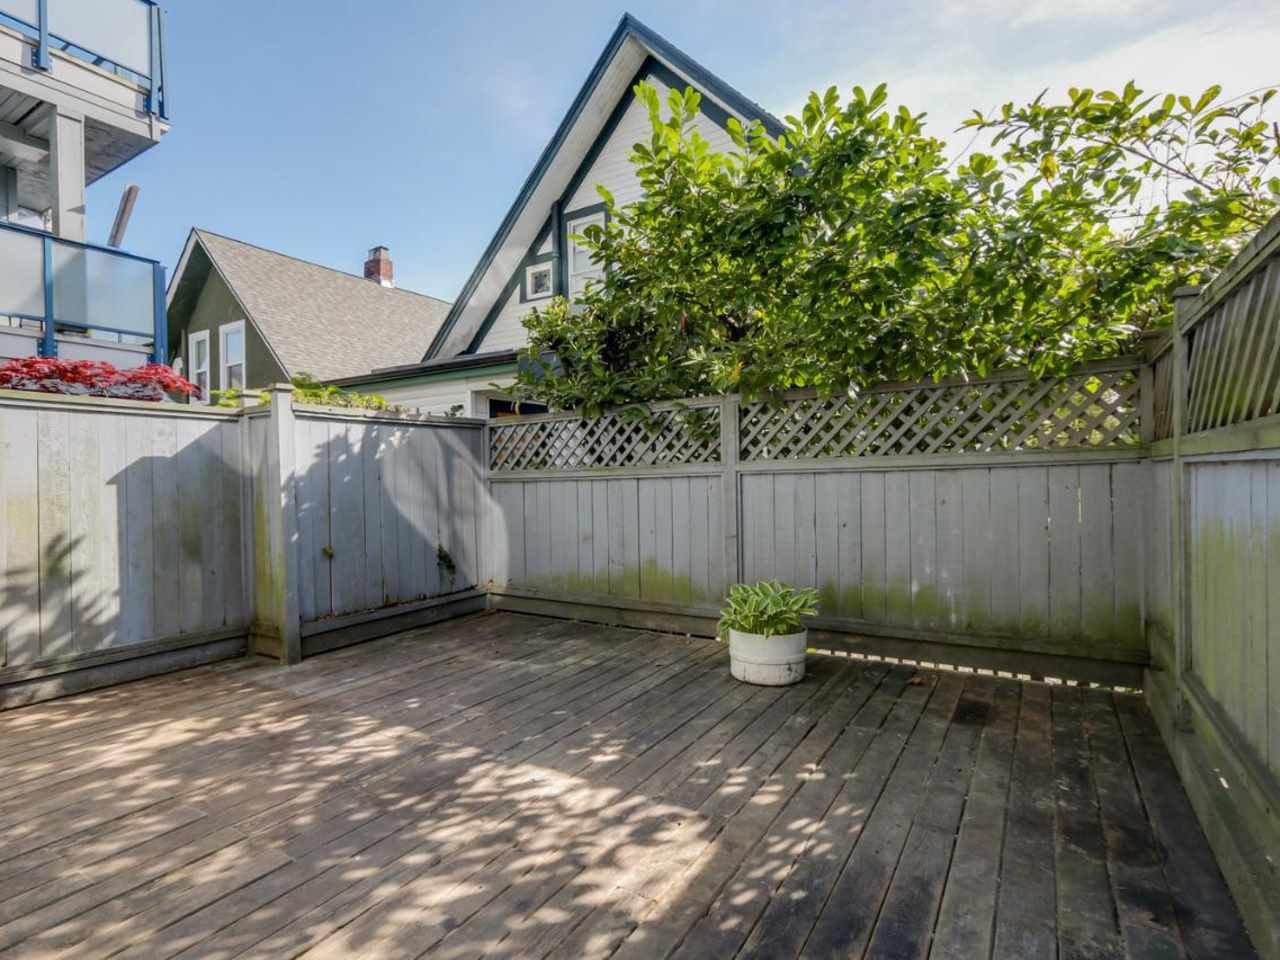 "Photo 2: Photos: 115 2125 YORK Avenue in Vancouver: Kitsilano Condo for sale in ""YORK GARDENS"" (Vancouver West)  : MLS®# R2054686"